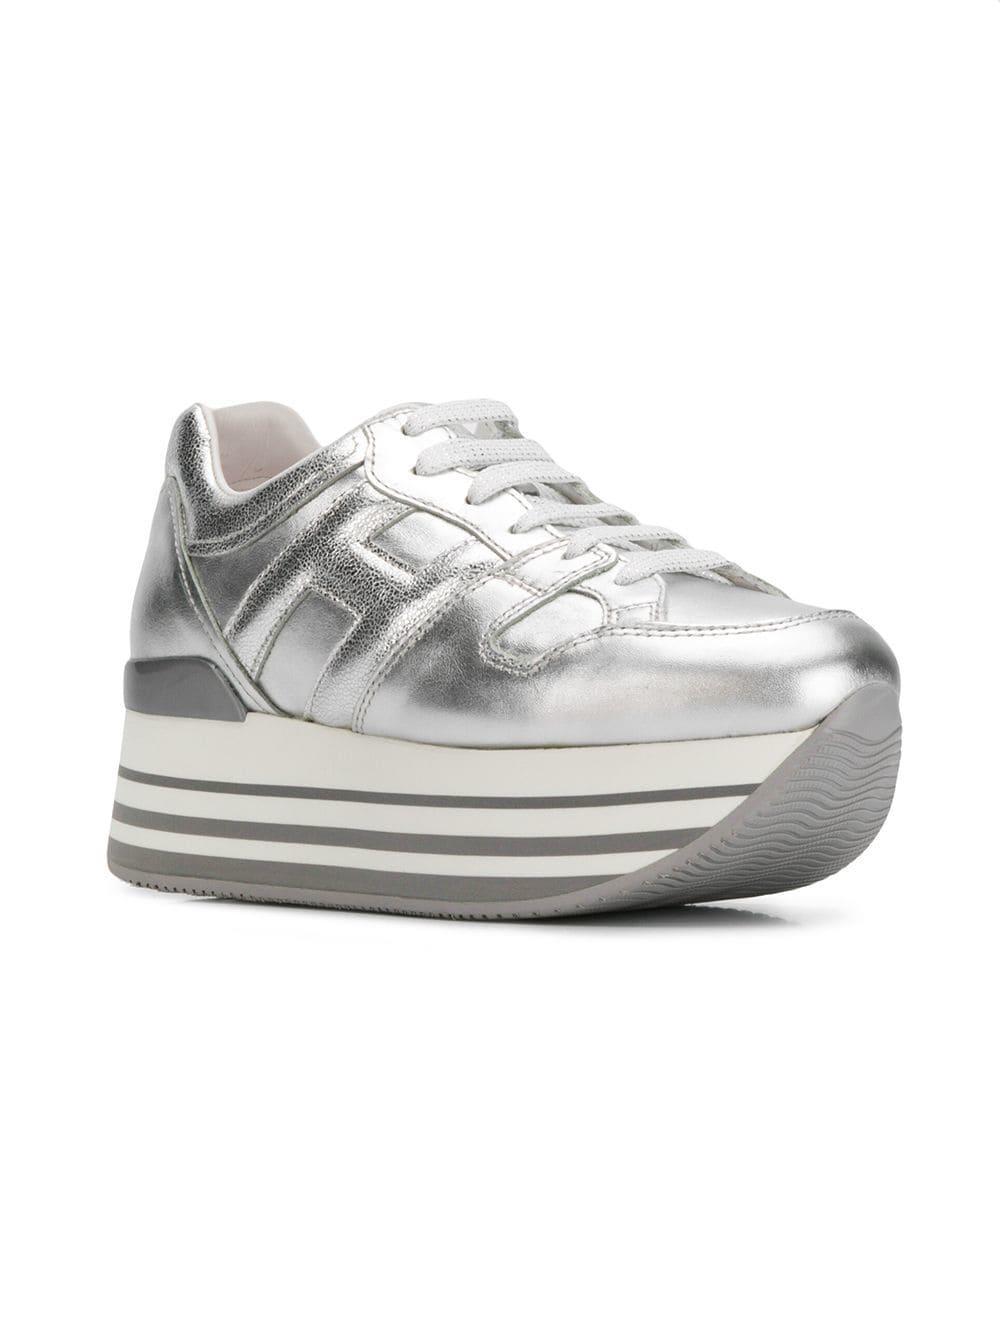 37c4ce2b536 Hogan - Metallic Striped Platform Sneakers - Lyst. View fullscreen